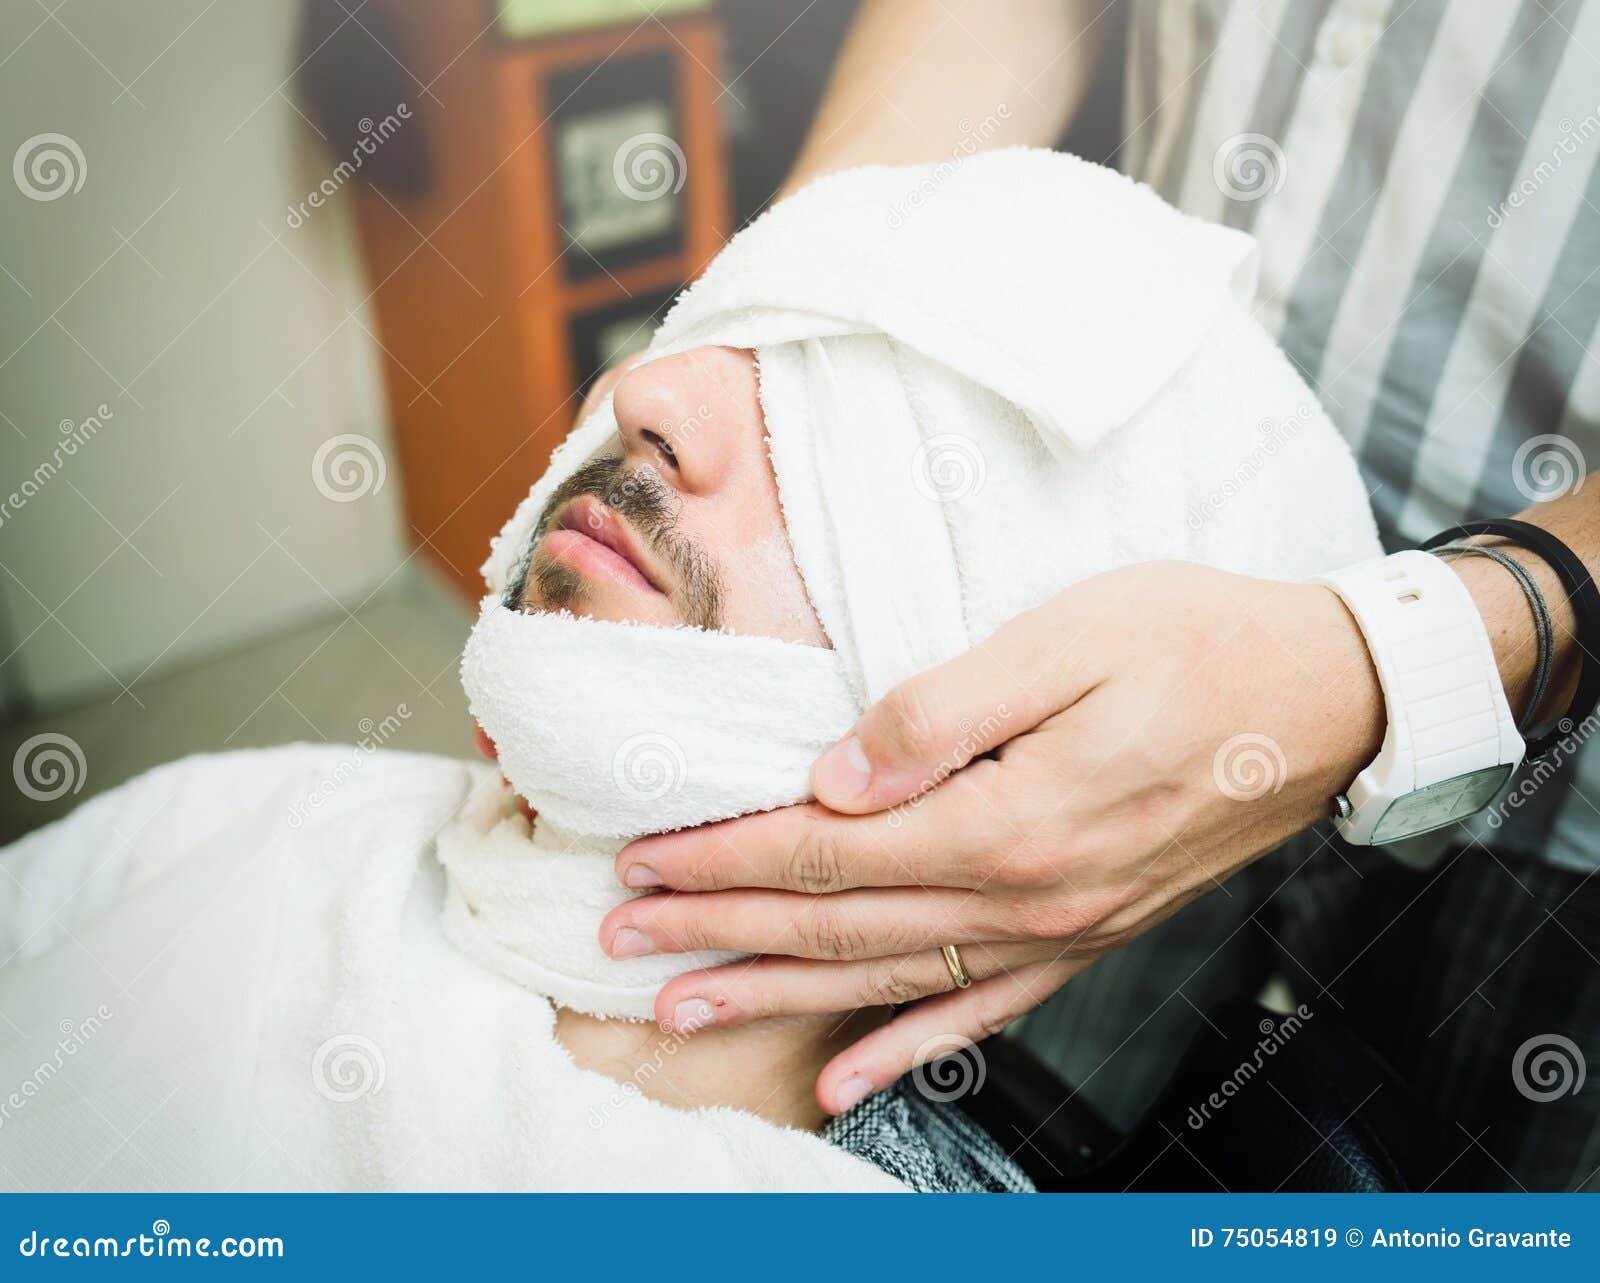 rituel traditionnel de raser la barbe image stock image du hommes lumineux 75054819. Black Bedroom Furniture Sets. Home Design Ideas